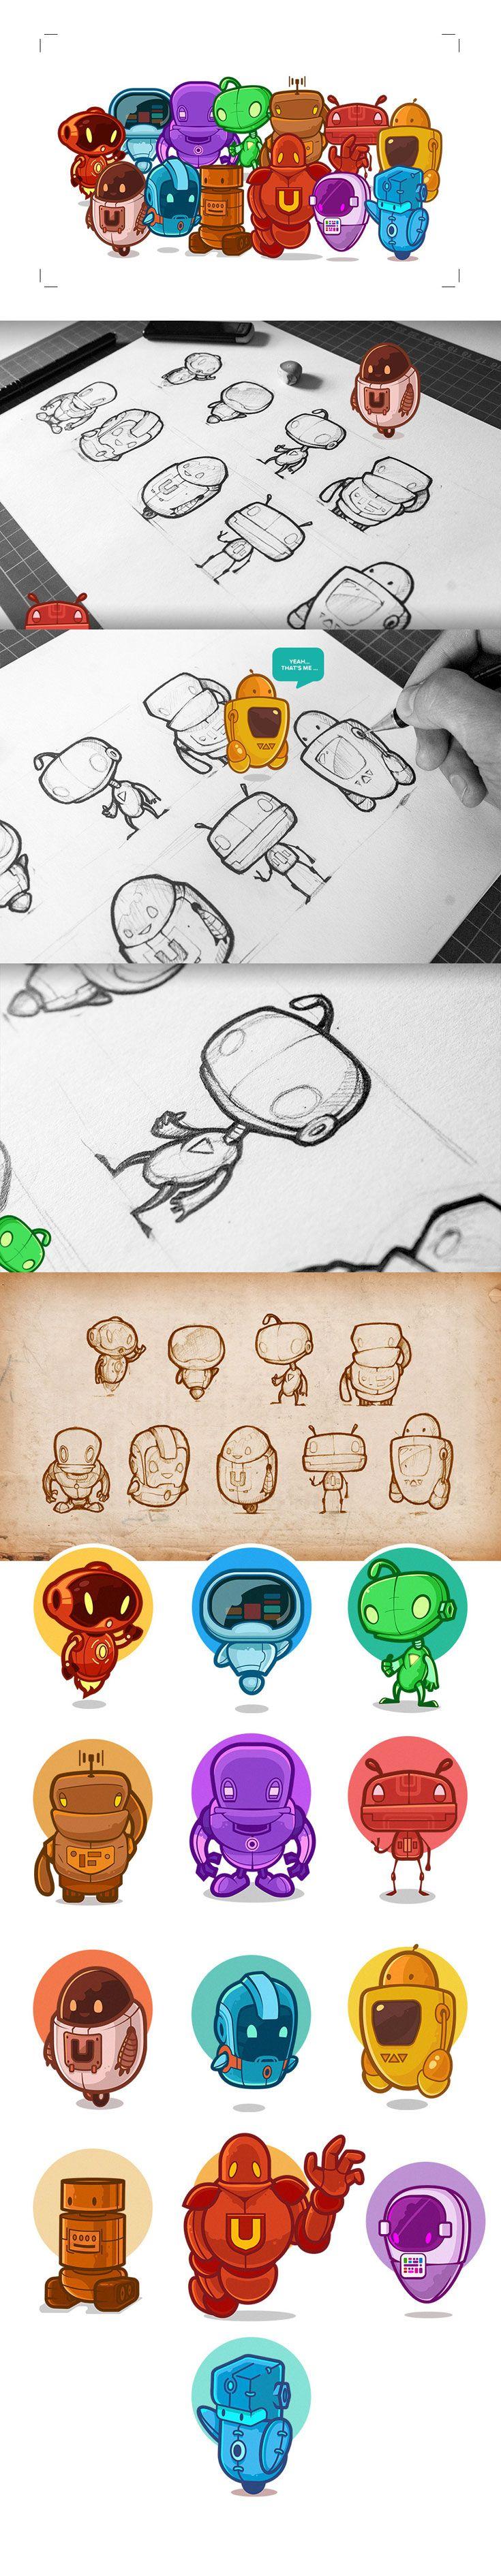 Illustration of Cute Little Robots by Tamas Moroz , designer and illustrator from Transylvania ( Cluj Napoca )// http://www.animhut.com/inspiration/cute-little-robots/